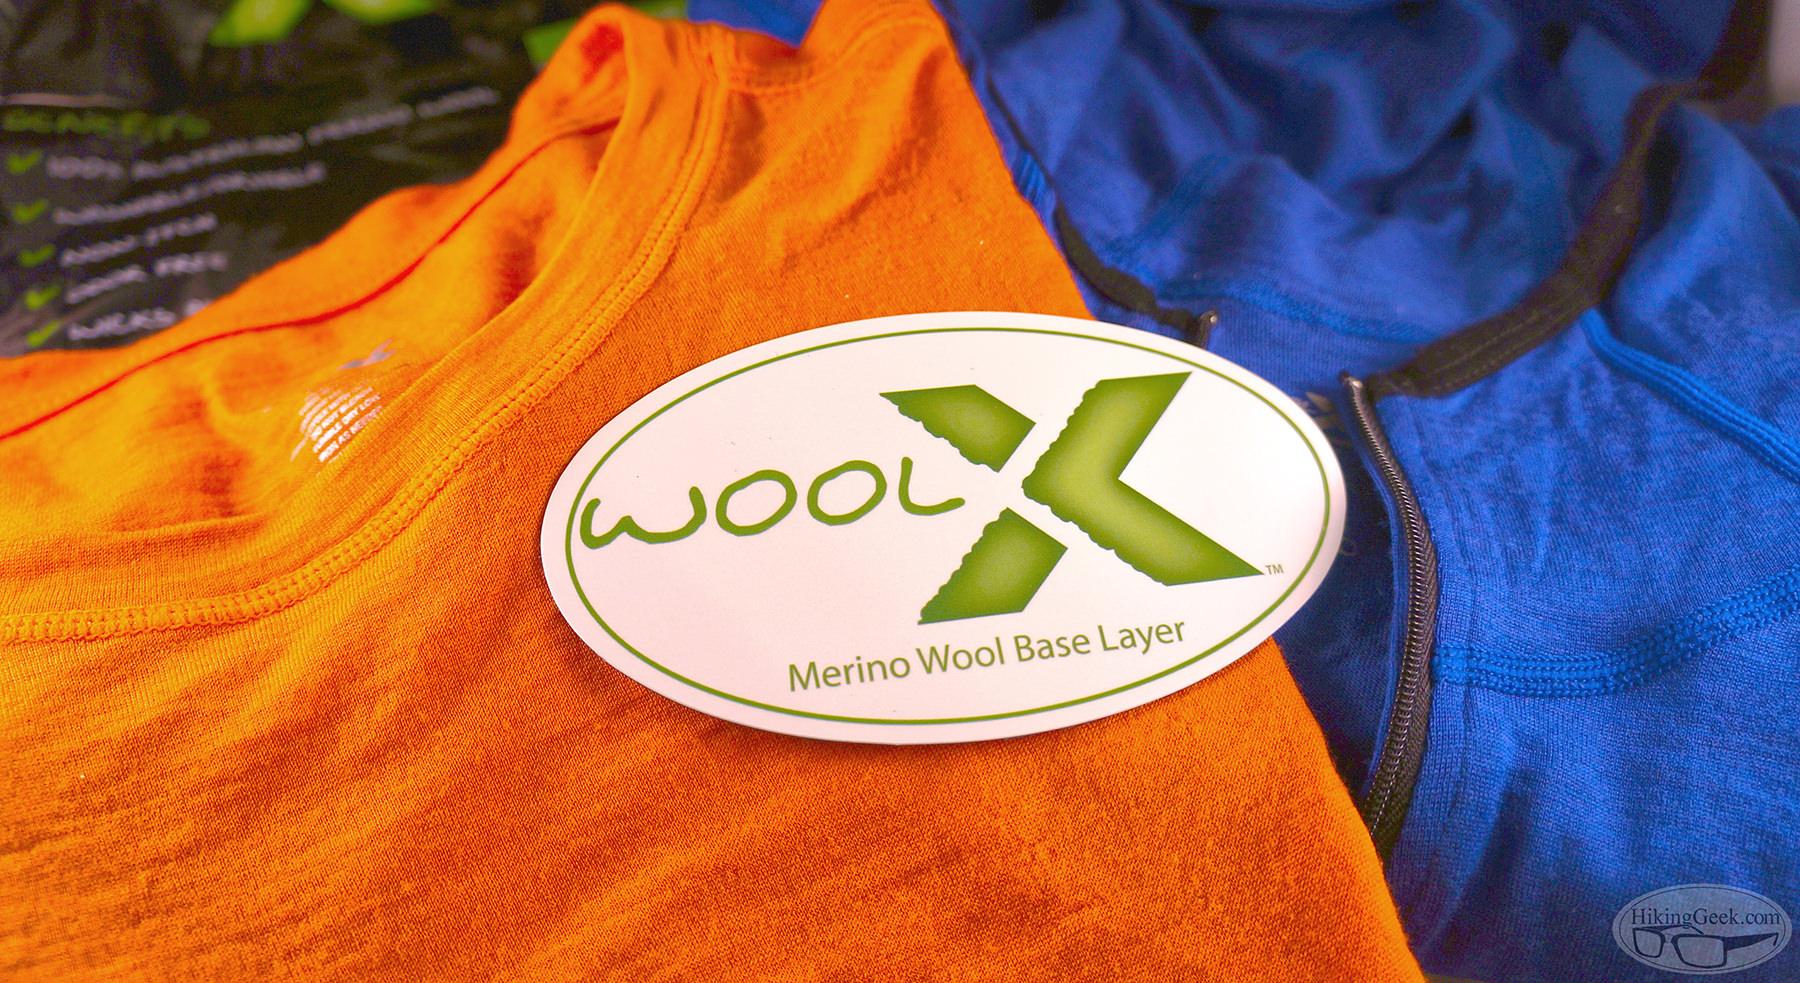 Gear Review: WoolX Lightweight Merino Wool Baselayer Series – T-shirt, Hoodie & Boxers